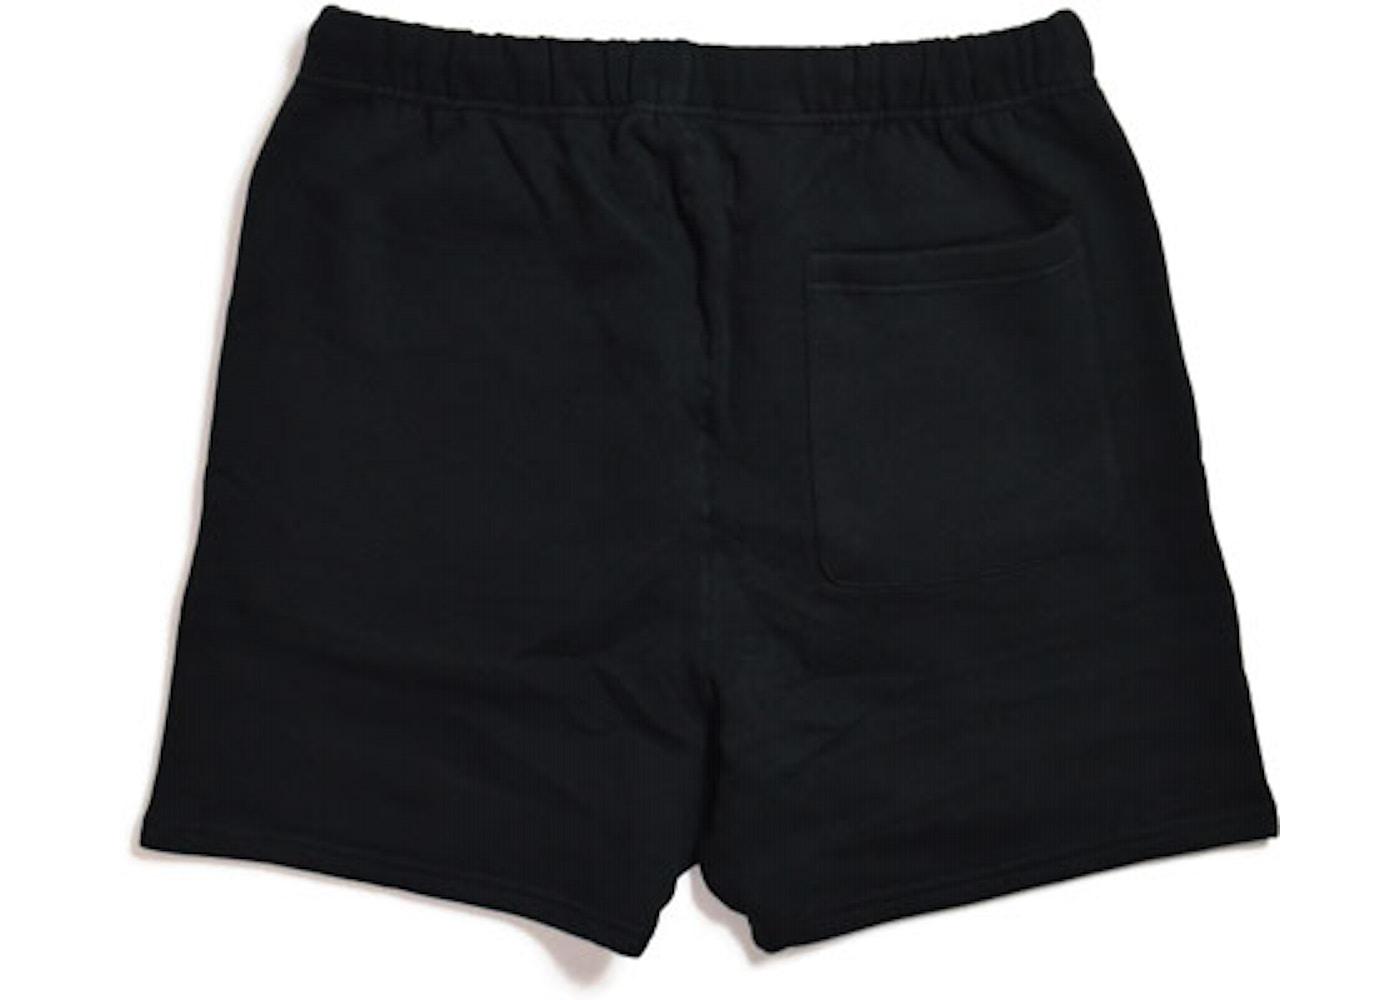 e61b02d6 FEAR OF GOD ESSENTIALS Sweat Shorts Black - FW19